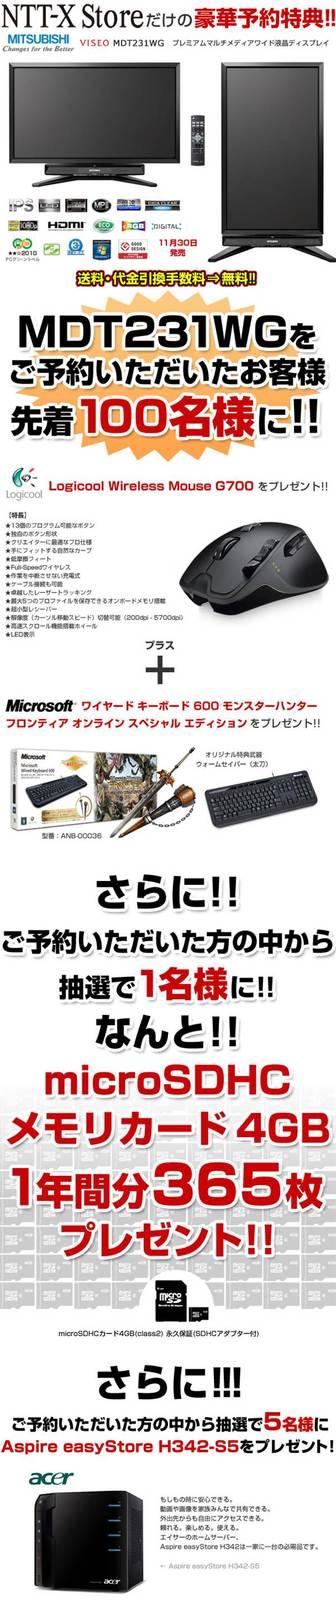 20101125130902e98_2